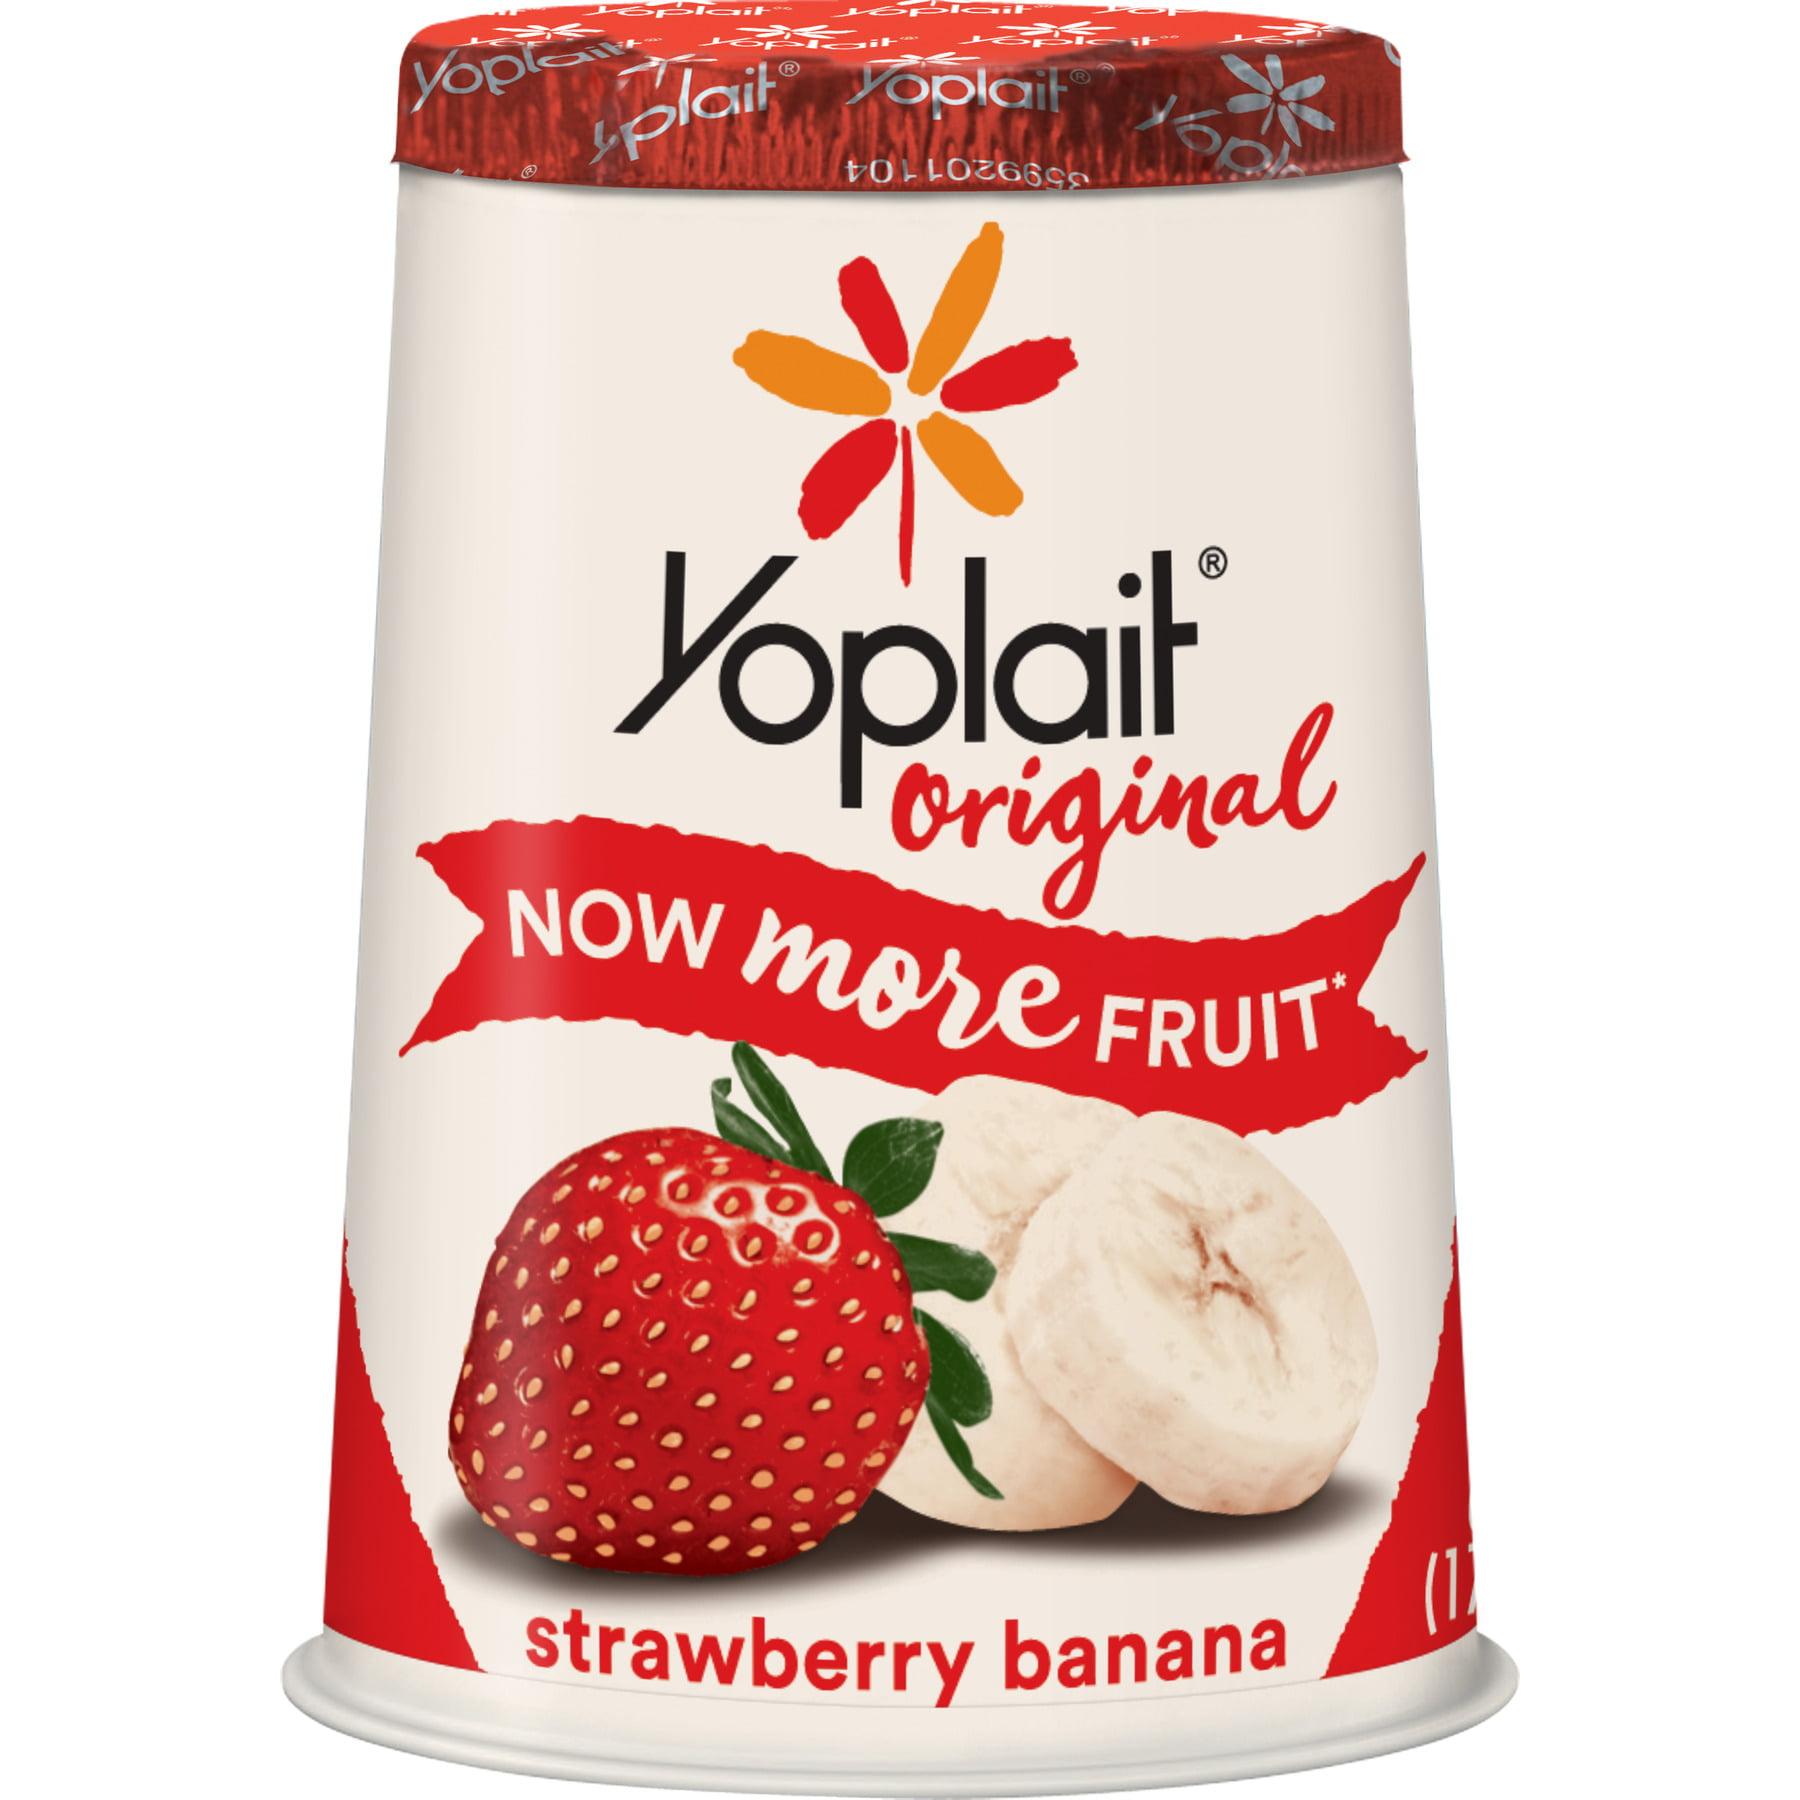 Yoplait Original Yogurt Strawberry Banana, 6 oz Cup